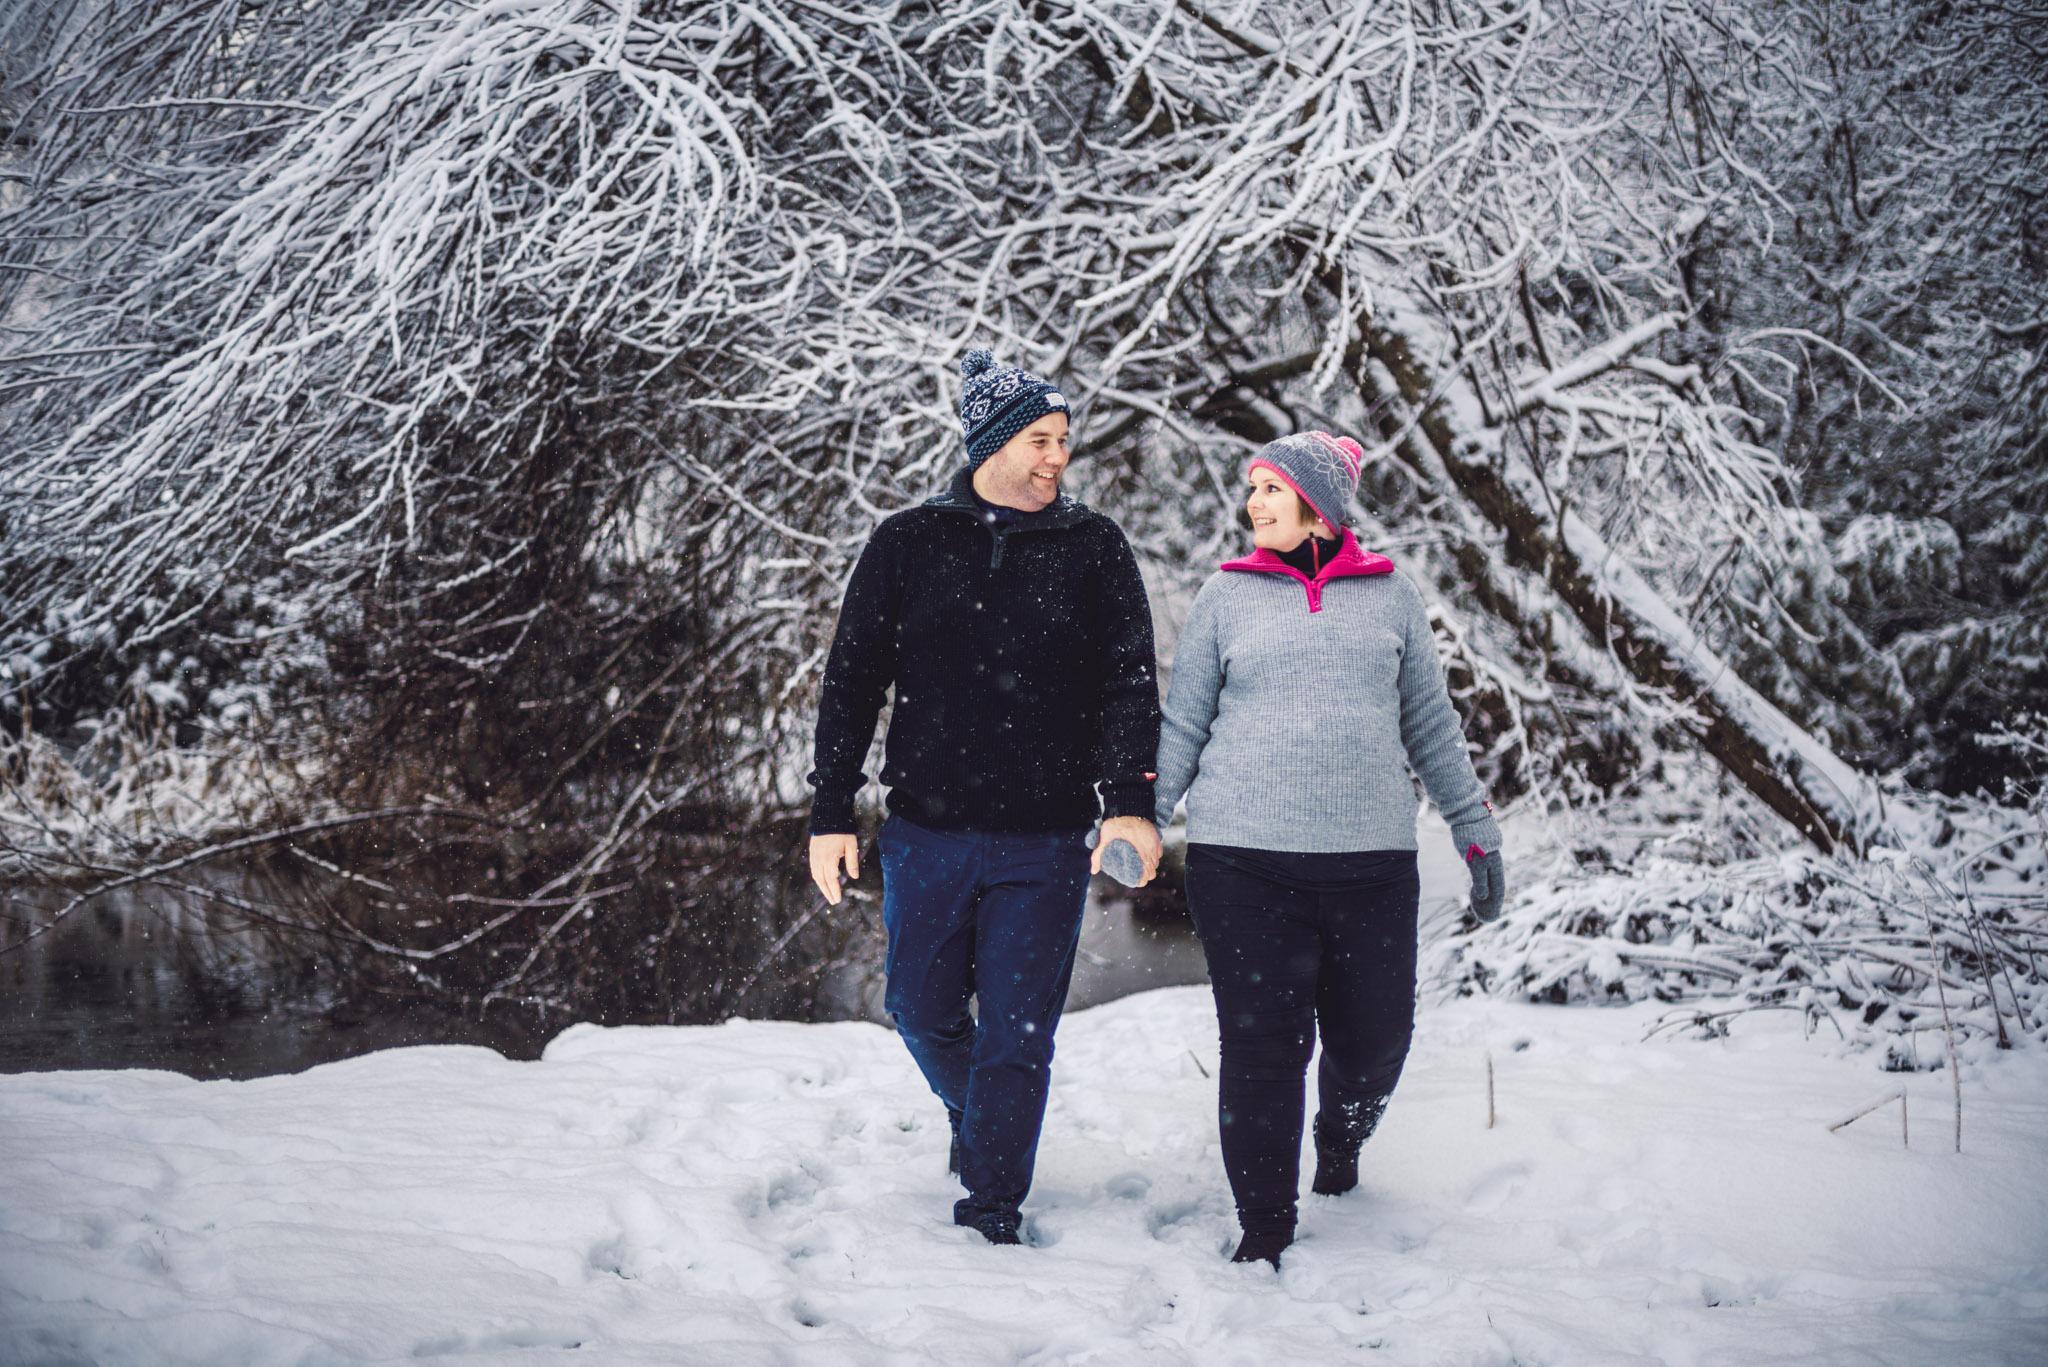 Bryllupsfotograf- stavanger-forlovet-vinterbilder-eirik-halvorsen-11.jpg